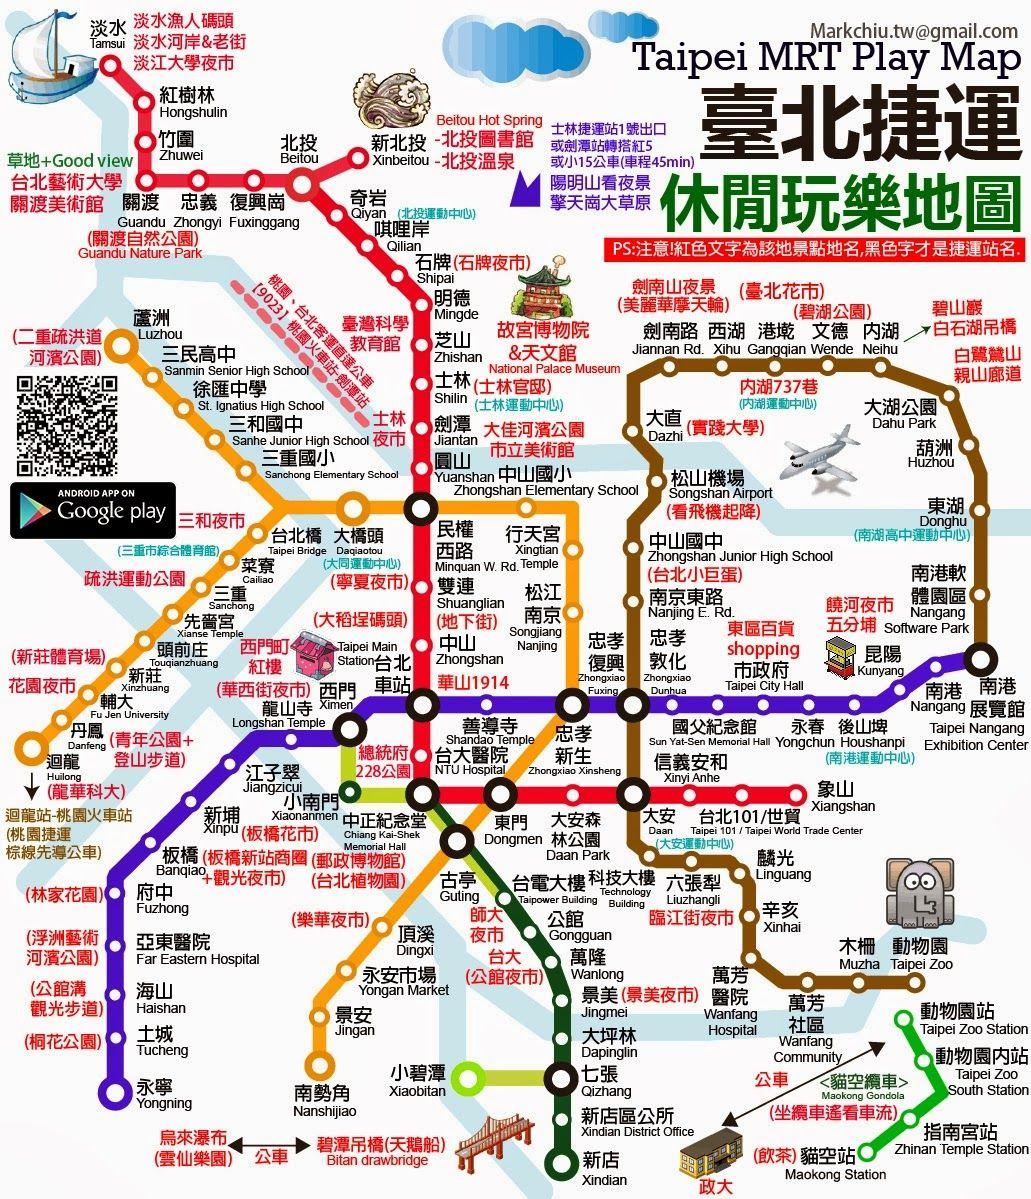 Taipei MRT Map 2014 | taipei-mrt-map-2014_v1.jpg | Map. Taipei. Taiwan travel